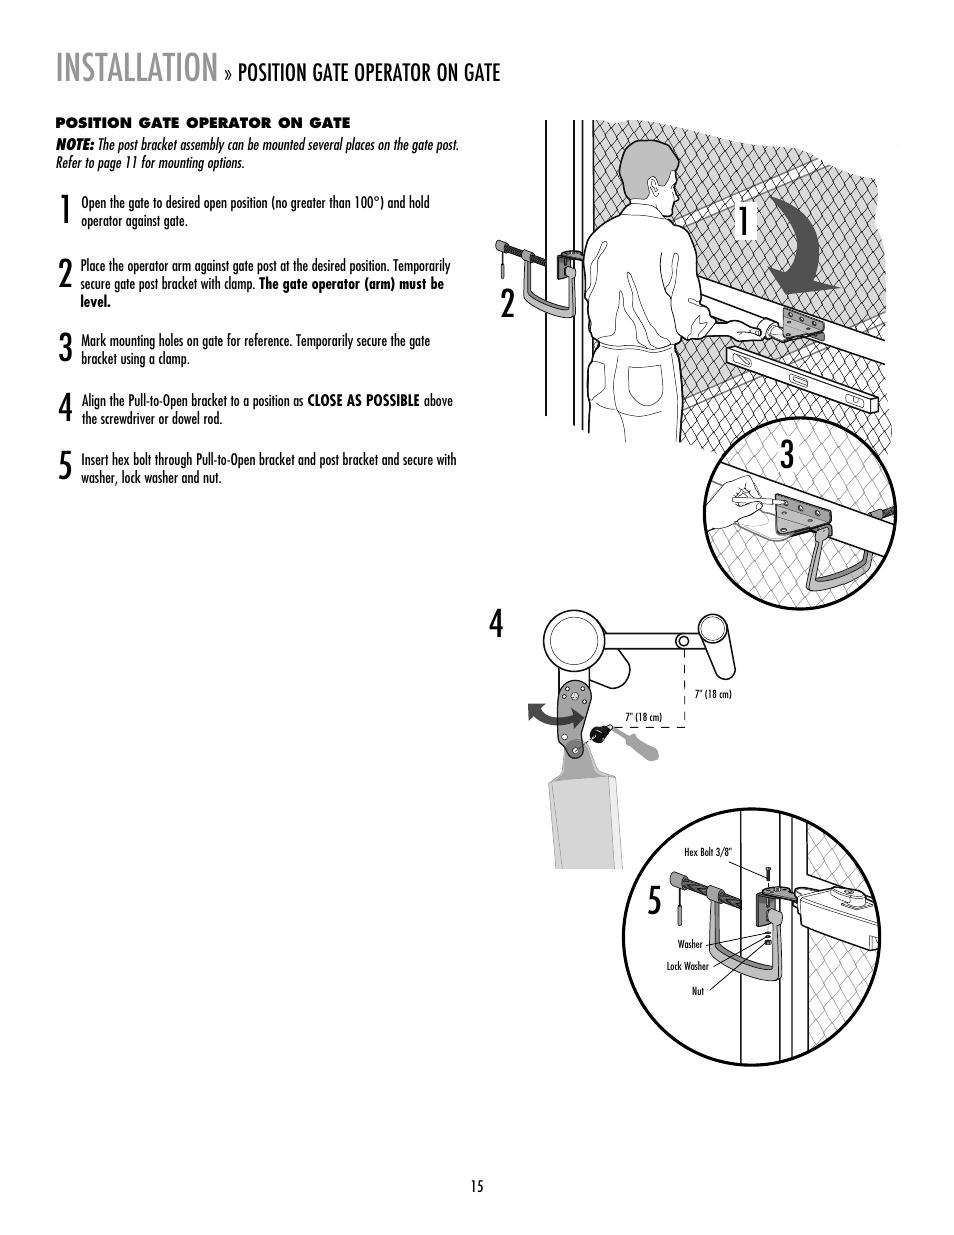 Liftmaster La Gate Opener Wiring Diagram on wayne dalton opener wiring diagram, crusader opener wiring diagram, genie garage opener wiring diagram, chamberlin opener wiring diagram,